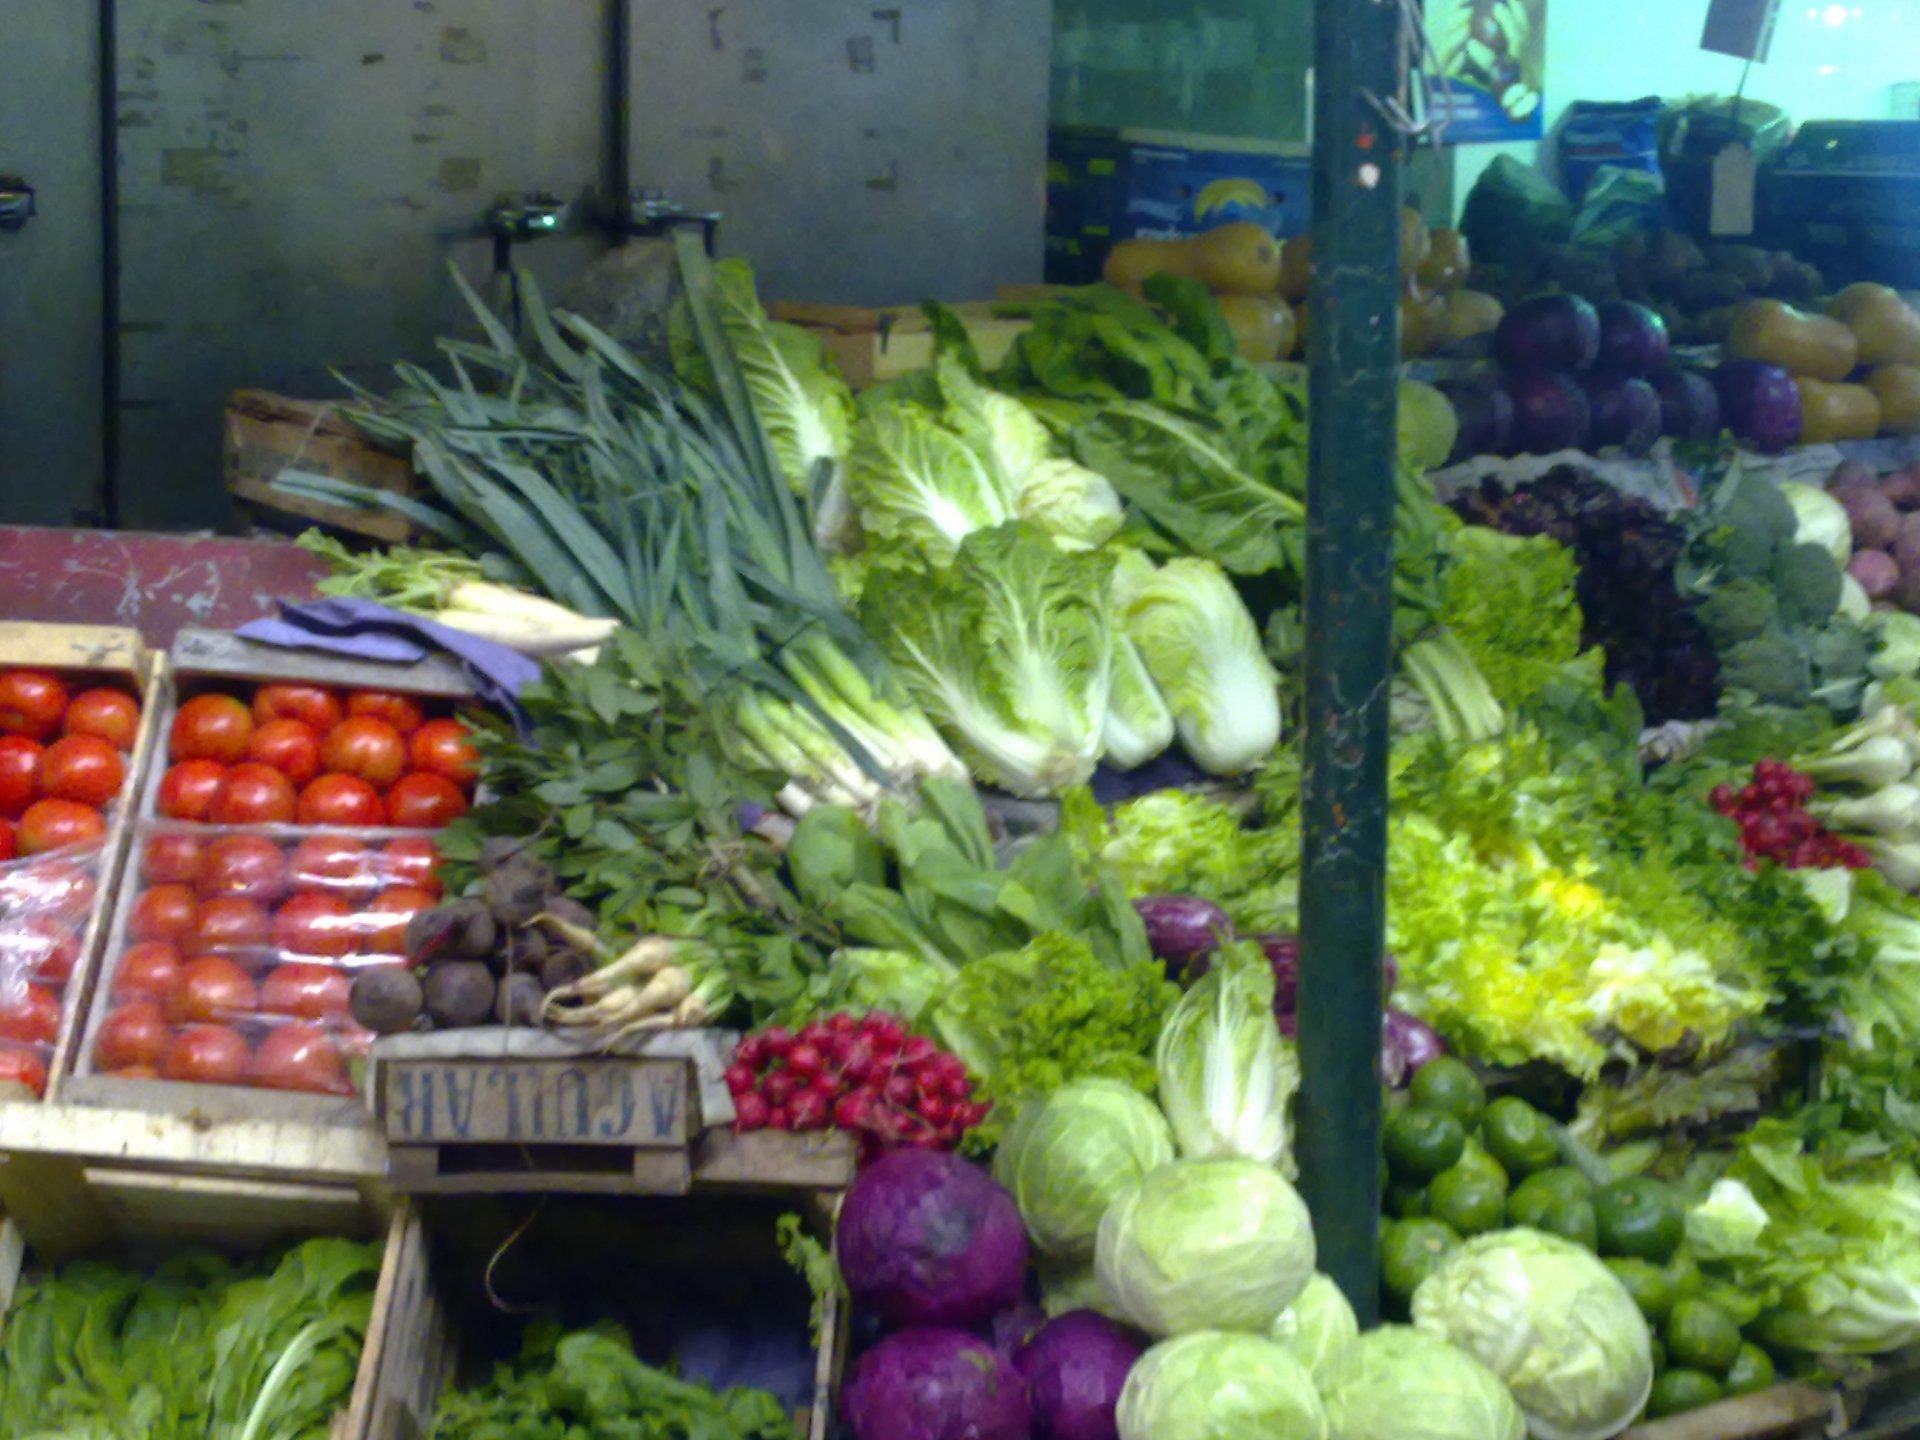 I sindacalisti di Fai Cisl, Flai Cgil e Uila Uil contrari ai voucher agricoltura